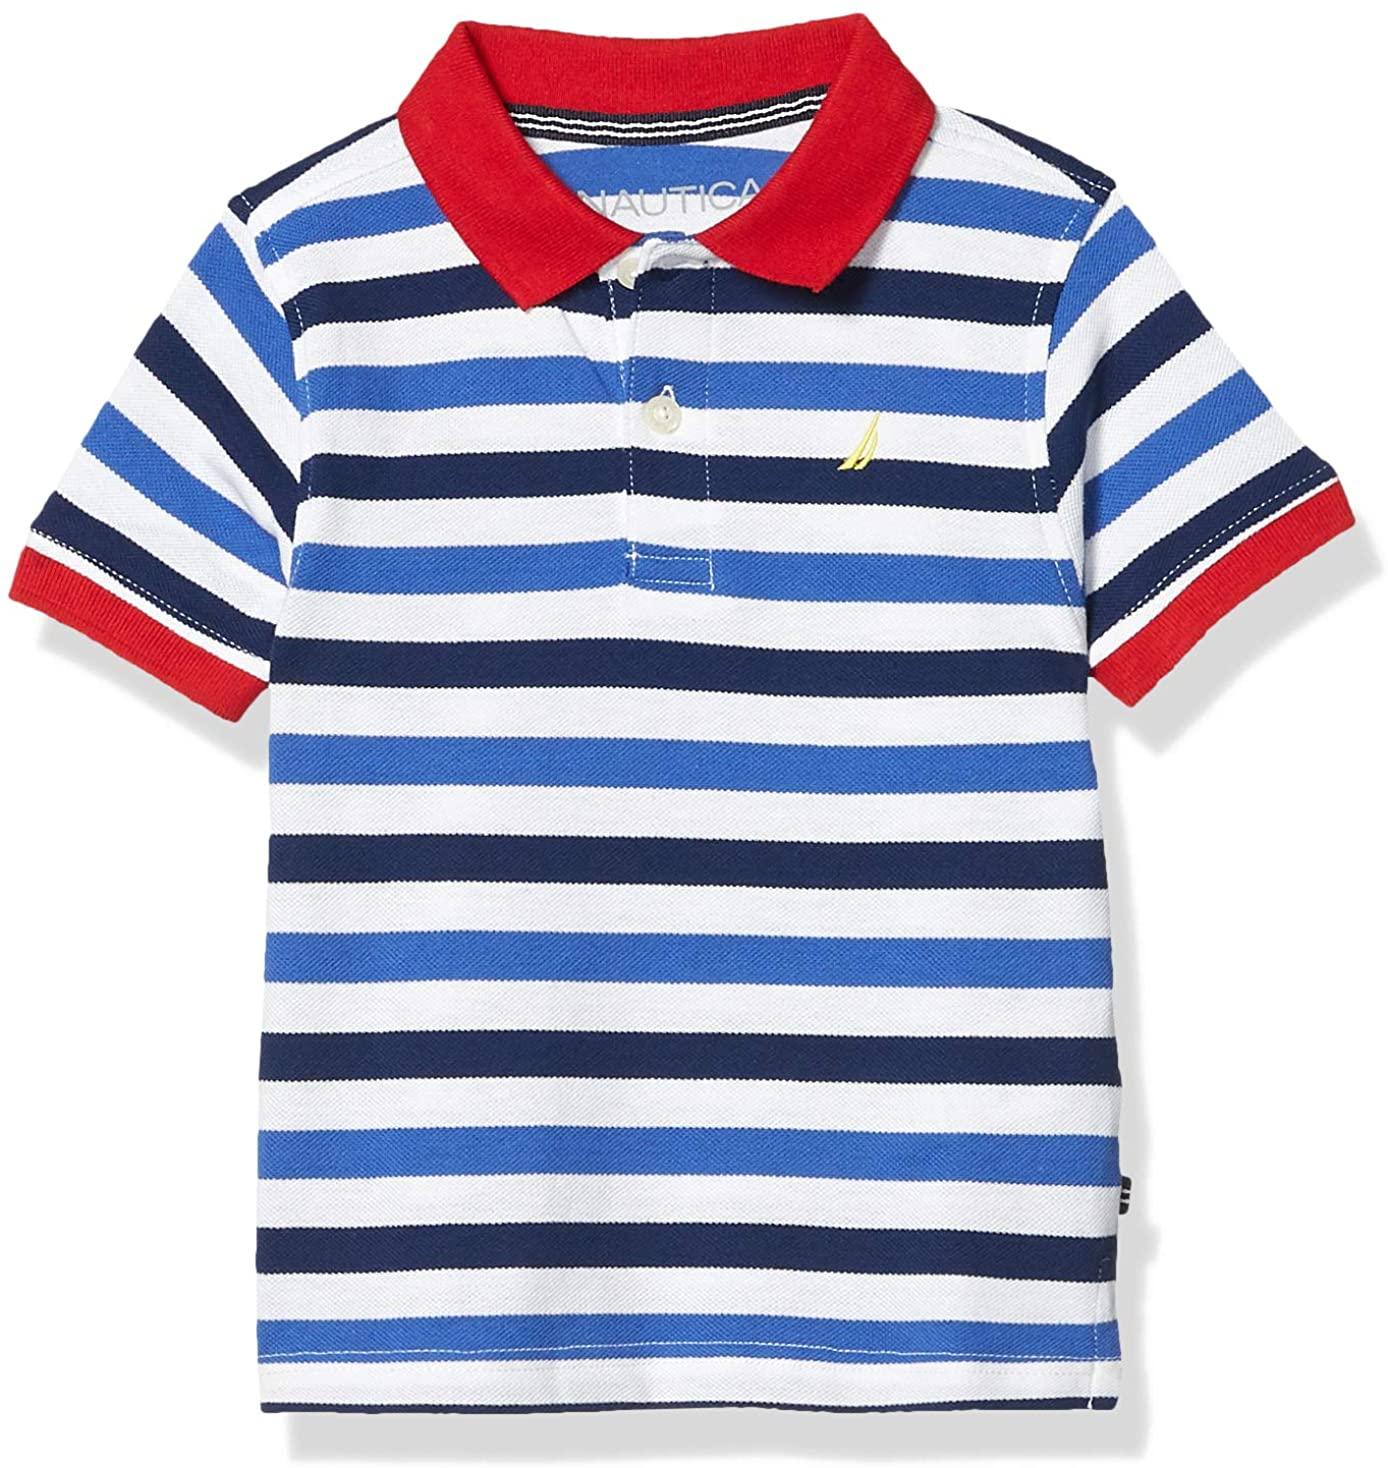 Nautica Boys' Short Sleeve Striped Polo